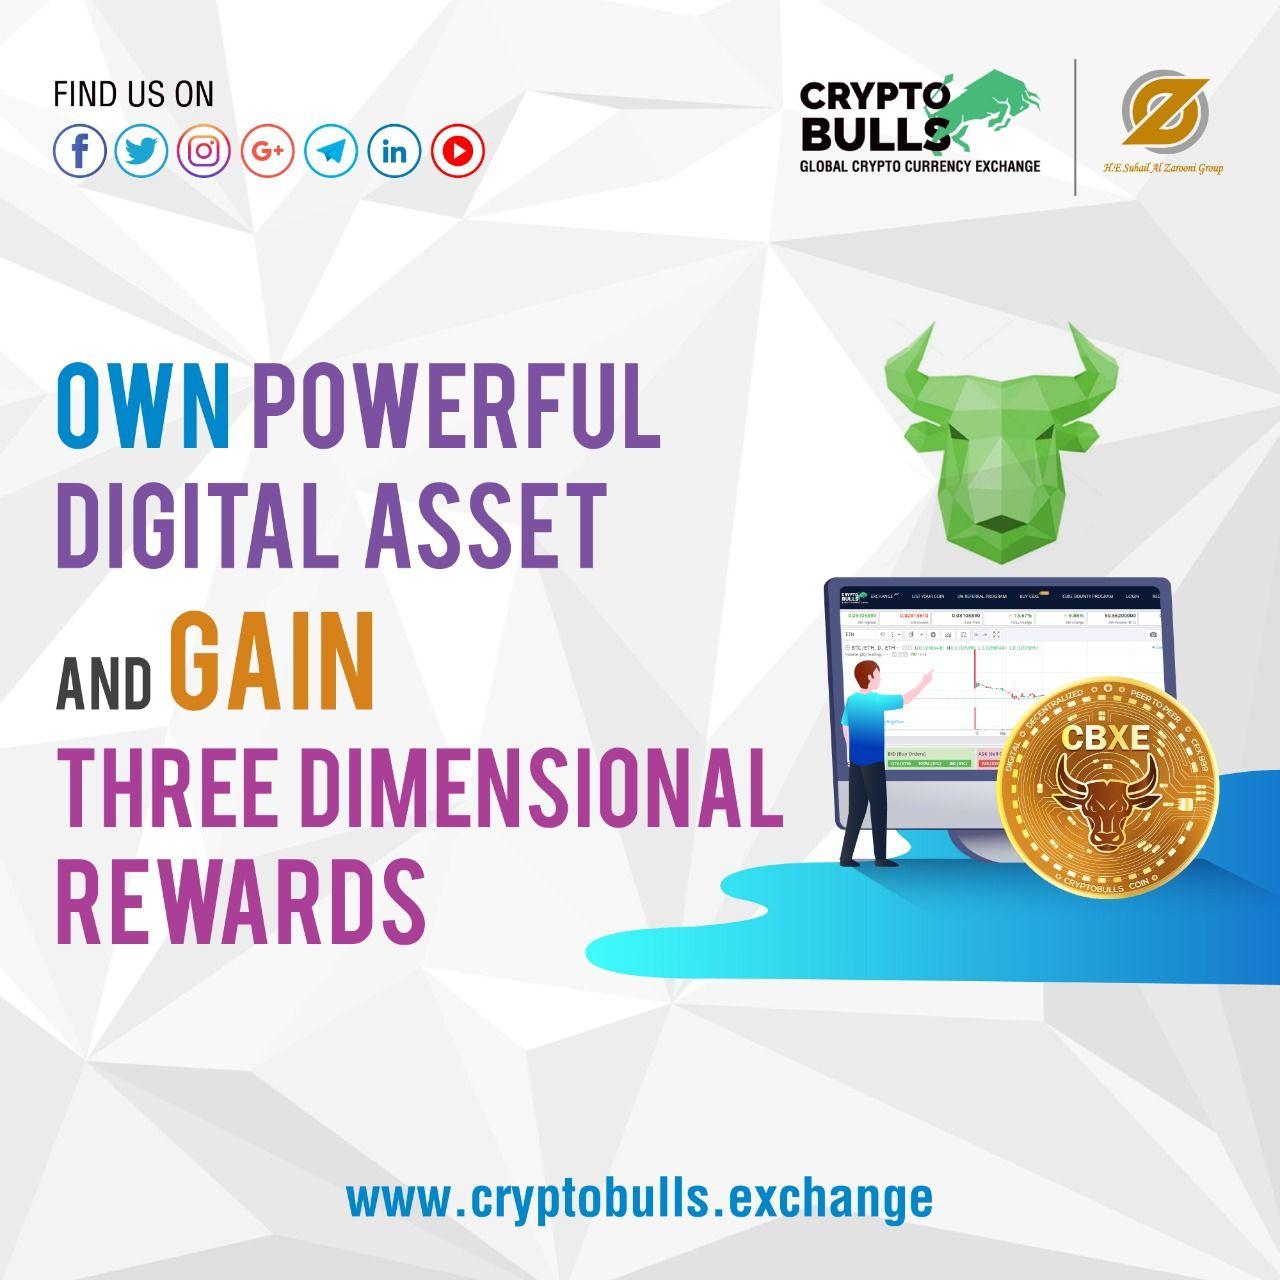 Own Powerful Digital Asset and Gain Three Dimensional